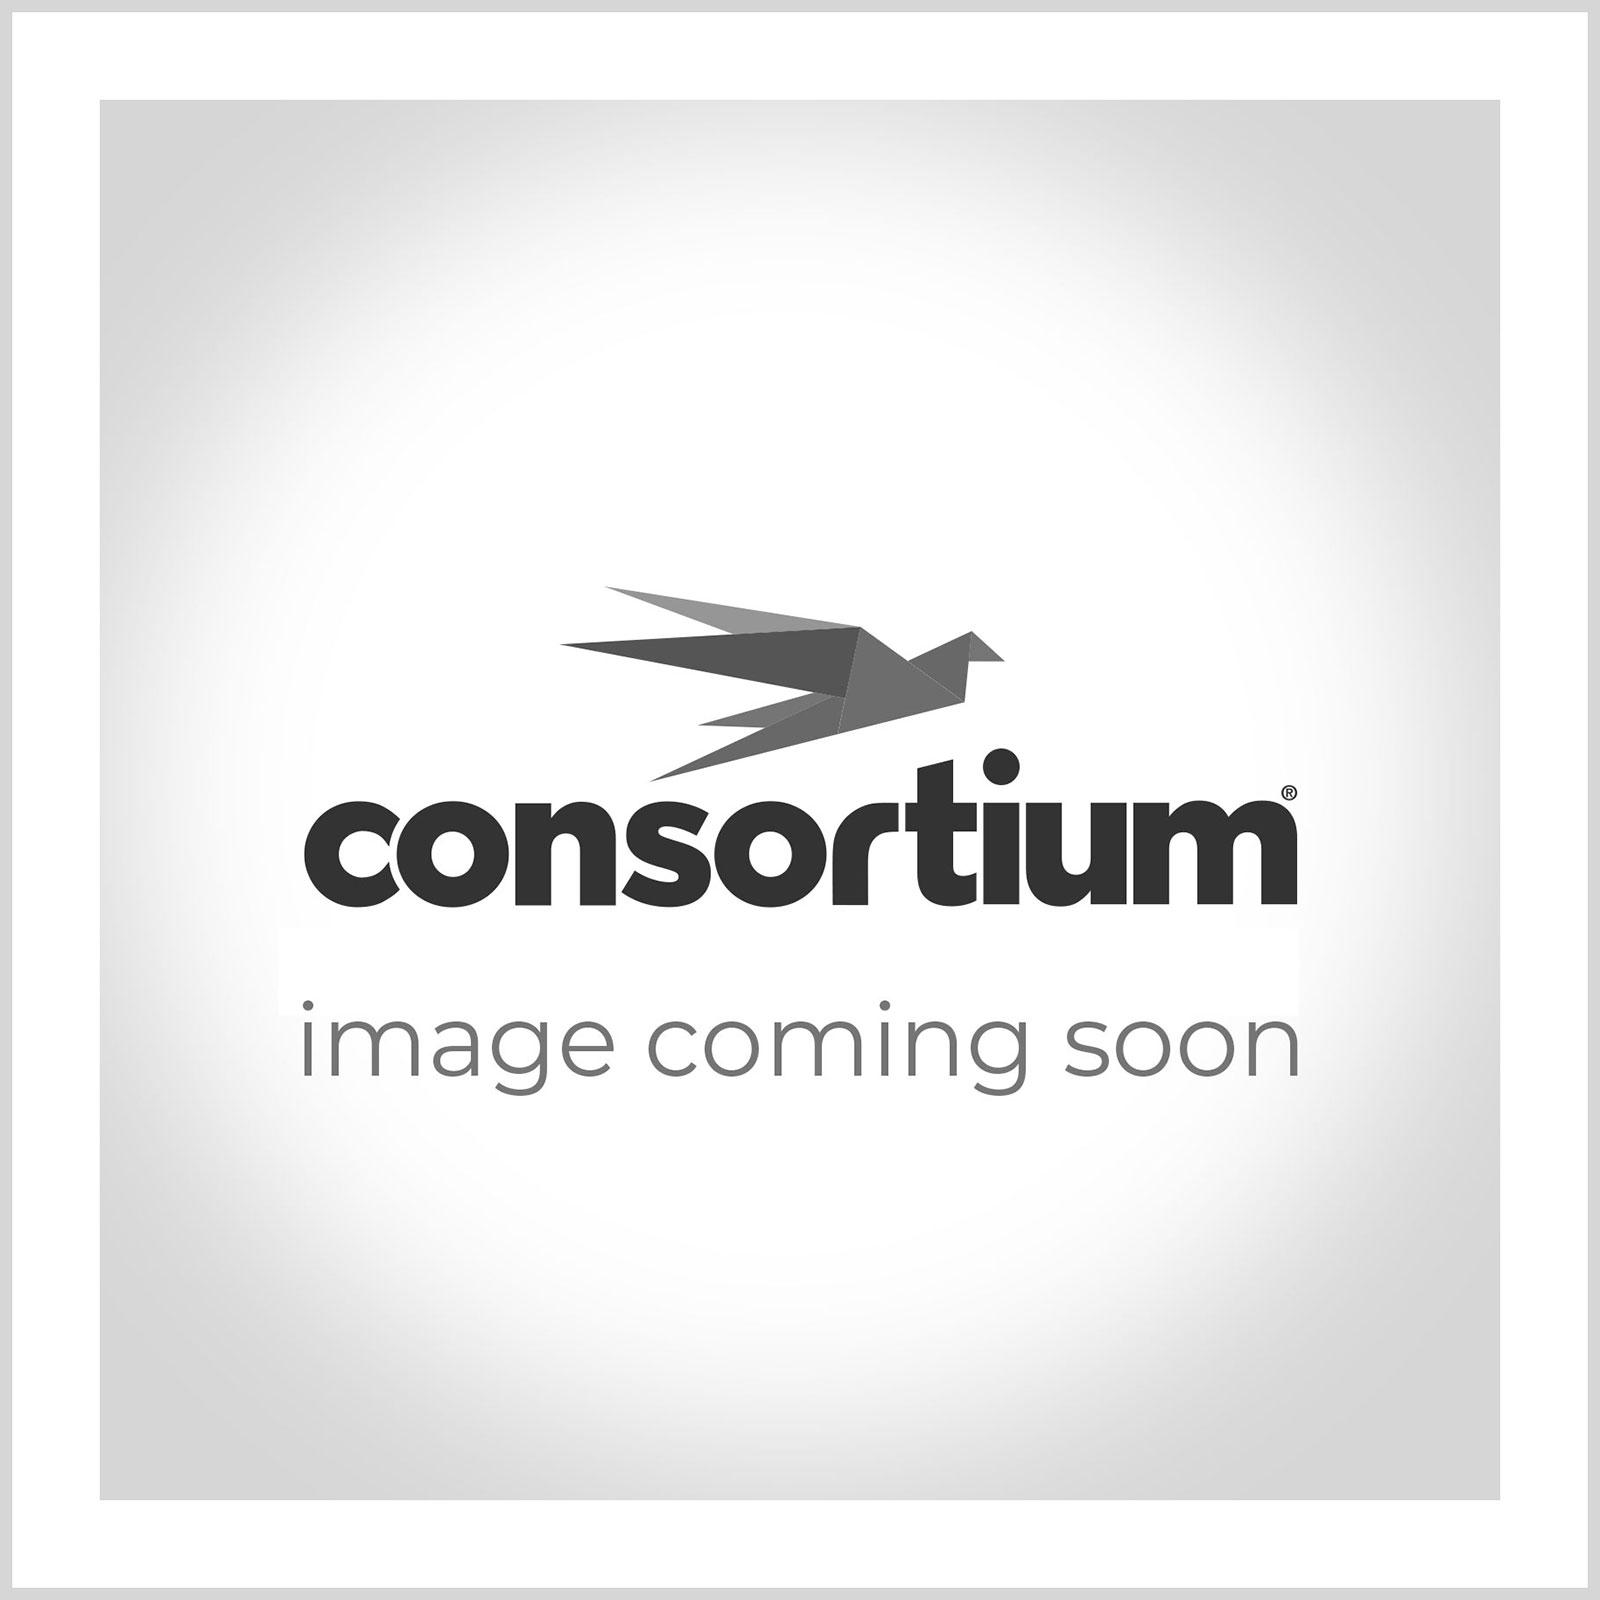 Consortium Chisel Tip Drywipe Markers